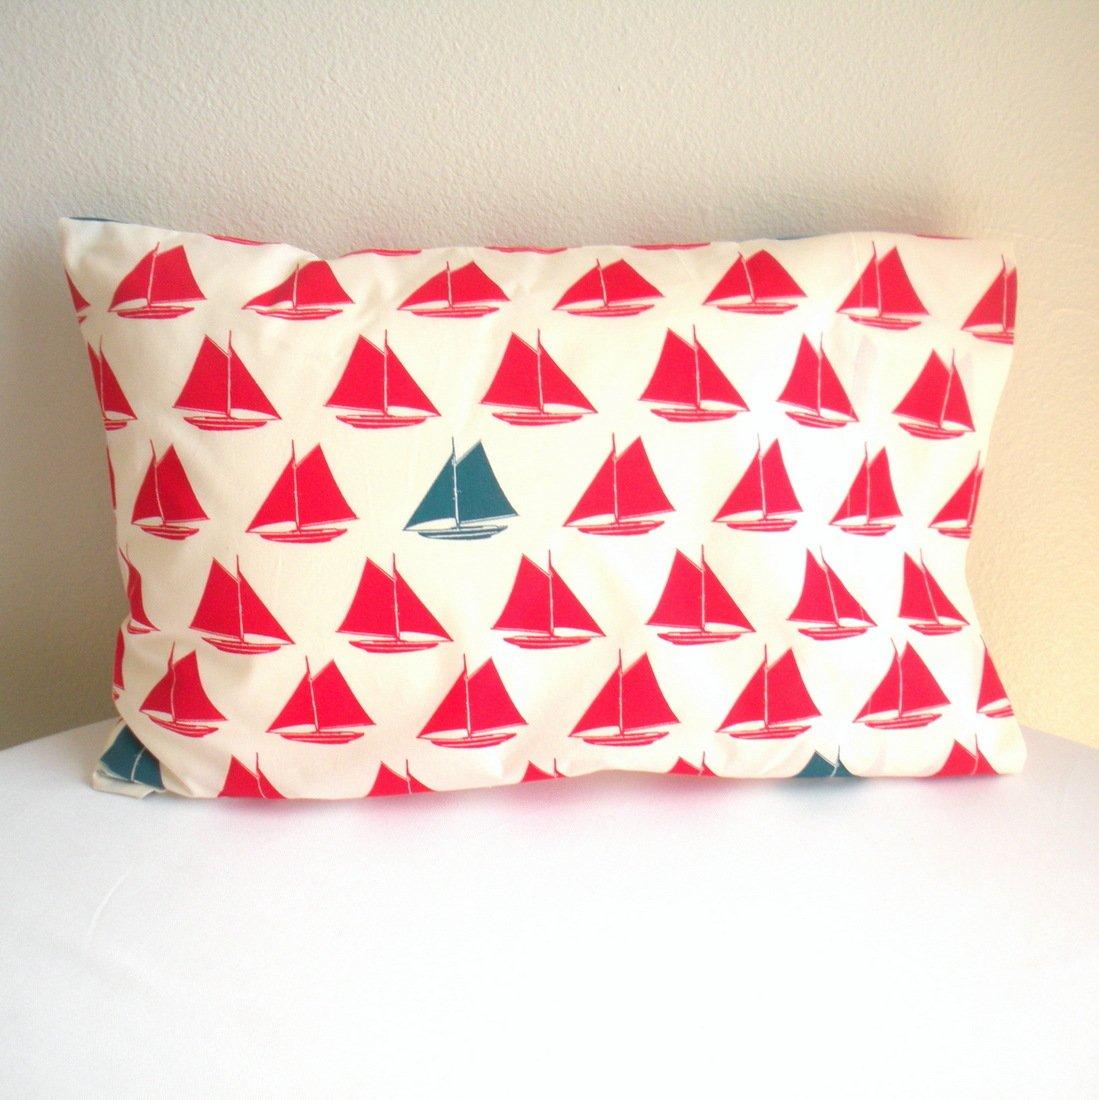 Island Picnic Organic Cotton Toddler/Travel Pillowcase - Red Sailboats 10pcs wick n vape cotton bacon v2 organic